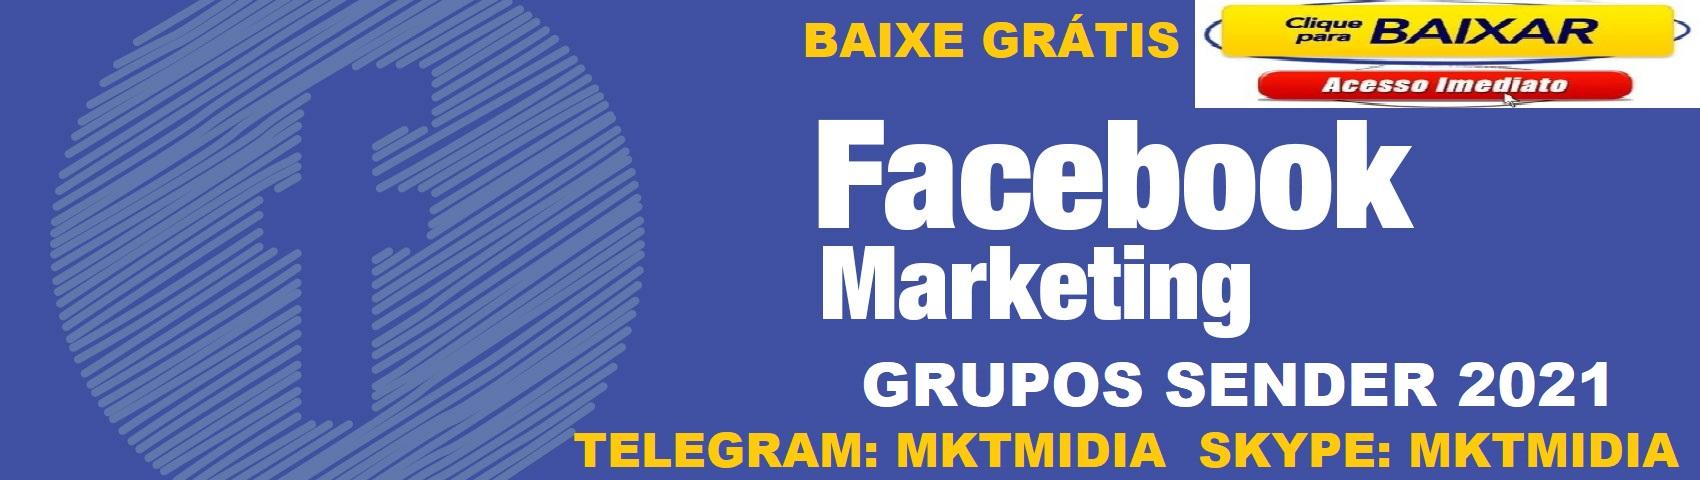 Software Envie Mensagem No Facebook Grupos 2021 – Download Gratuito